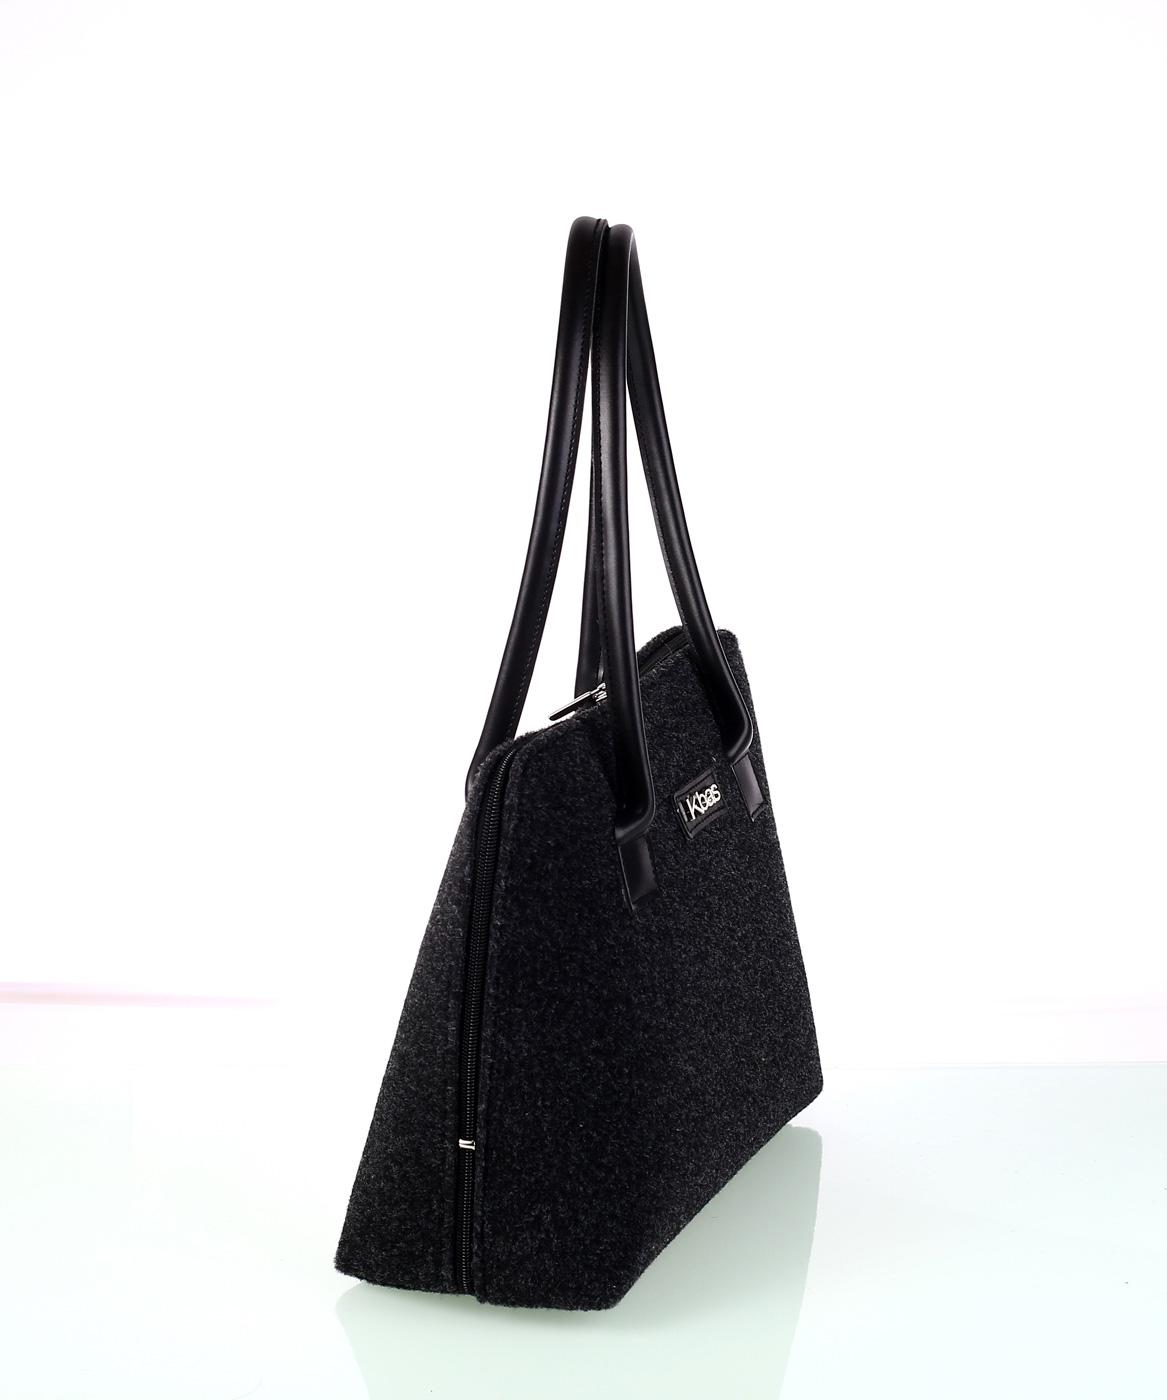 Elegantná dámska kabelka z plste Kbas čierna  4979ad21d79